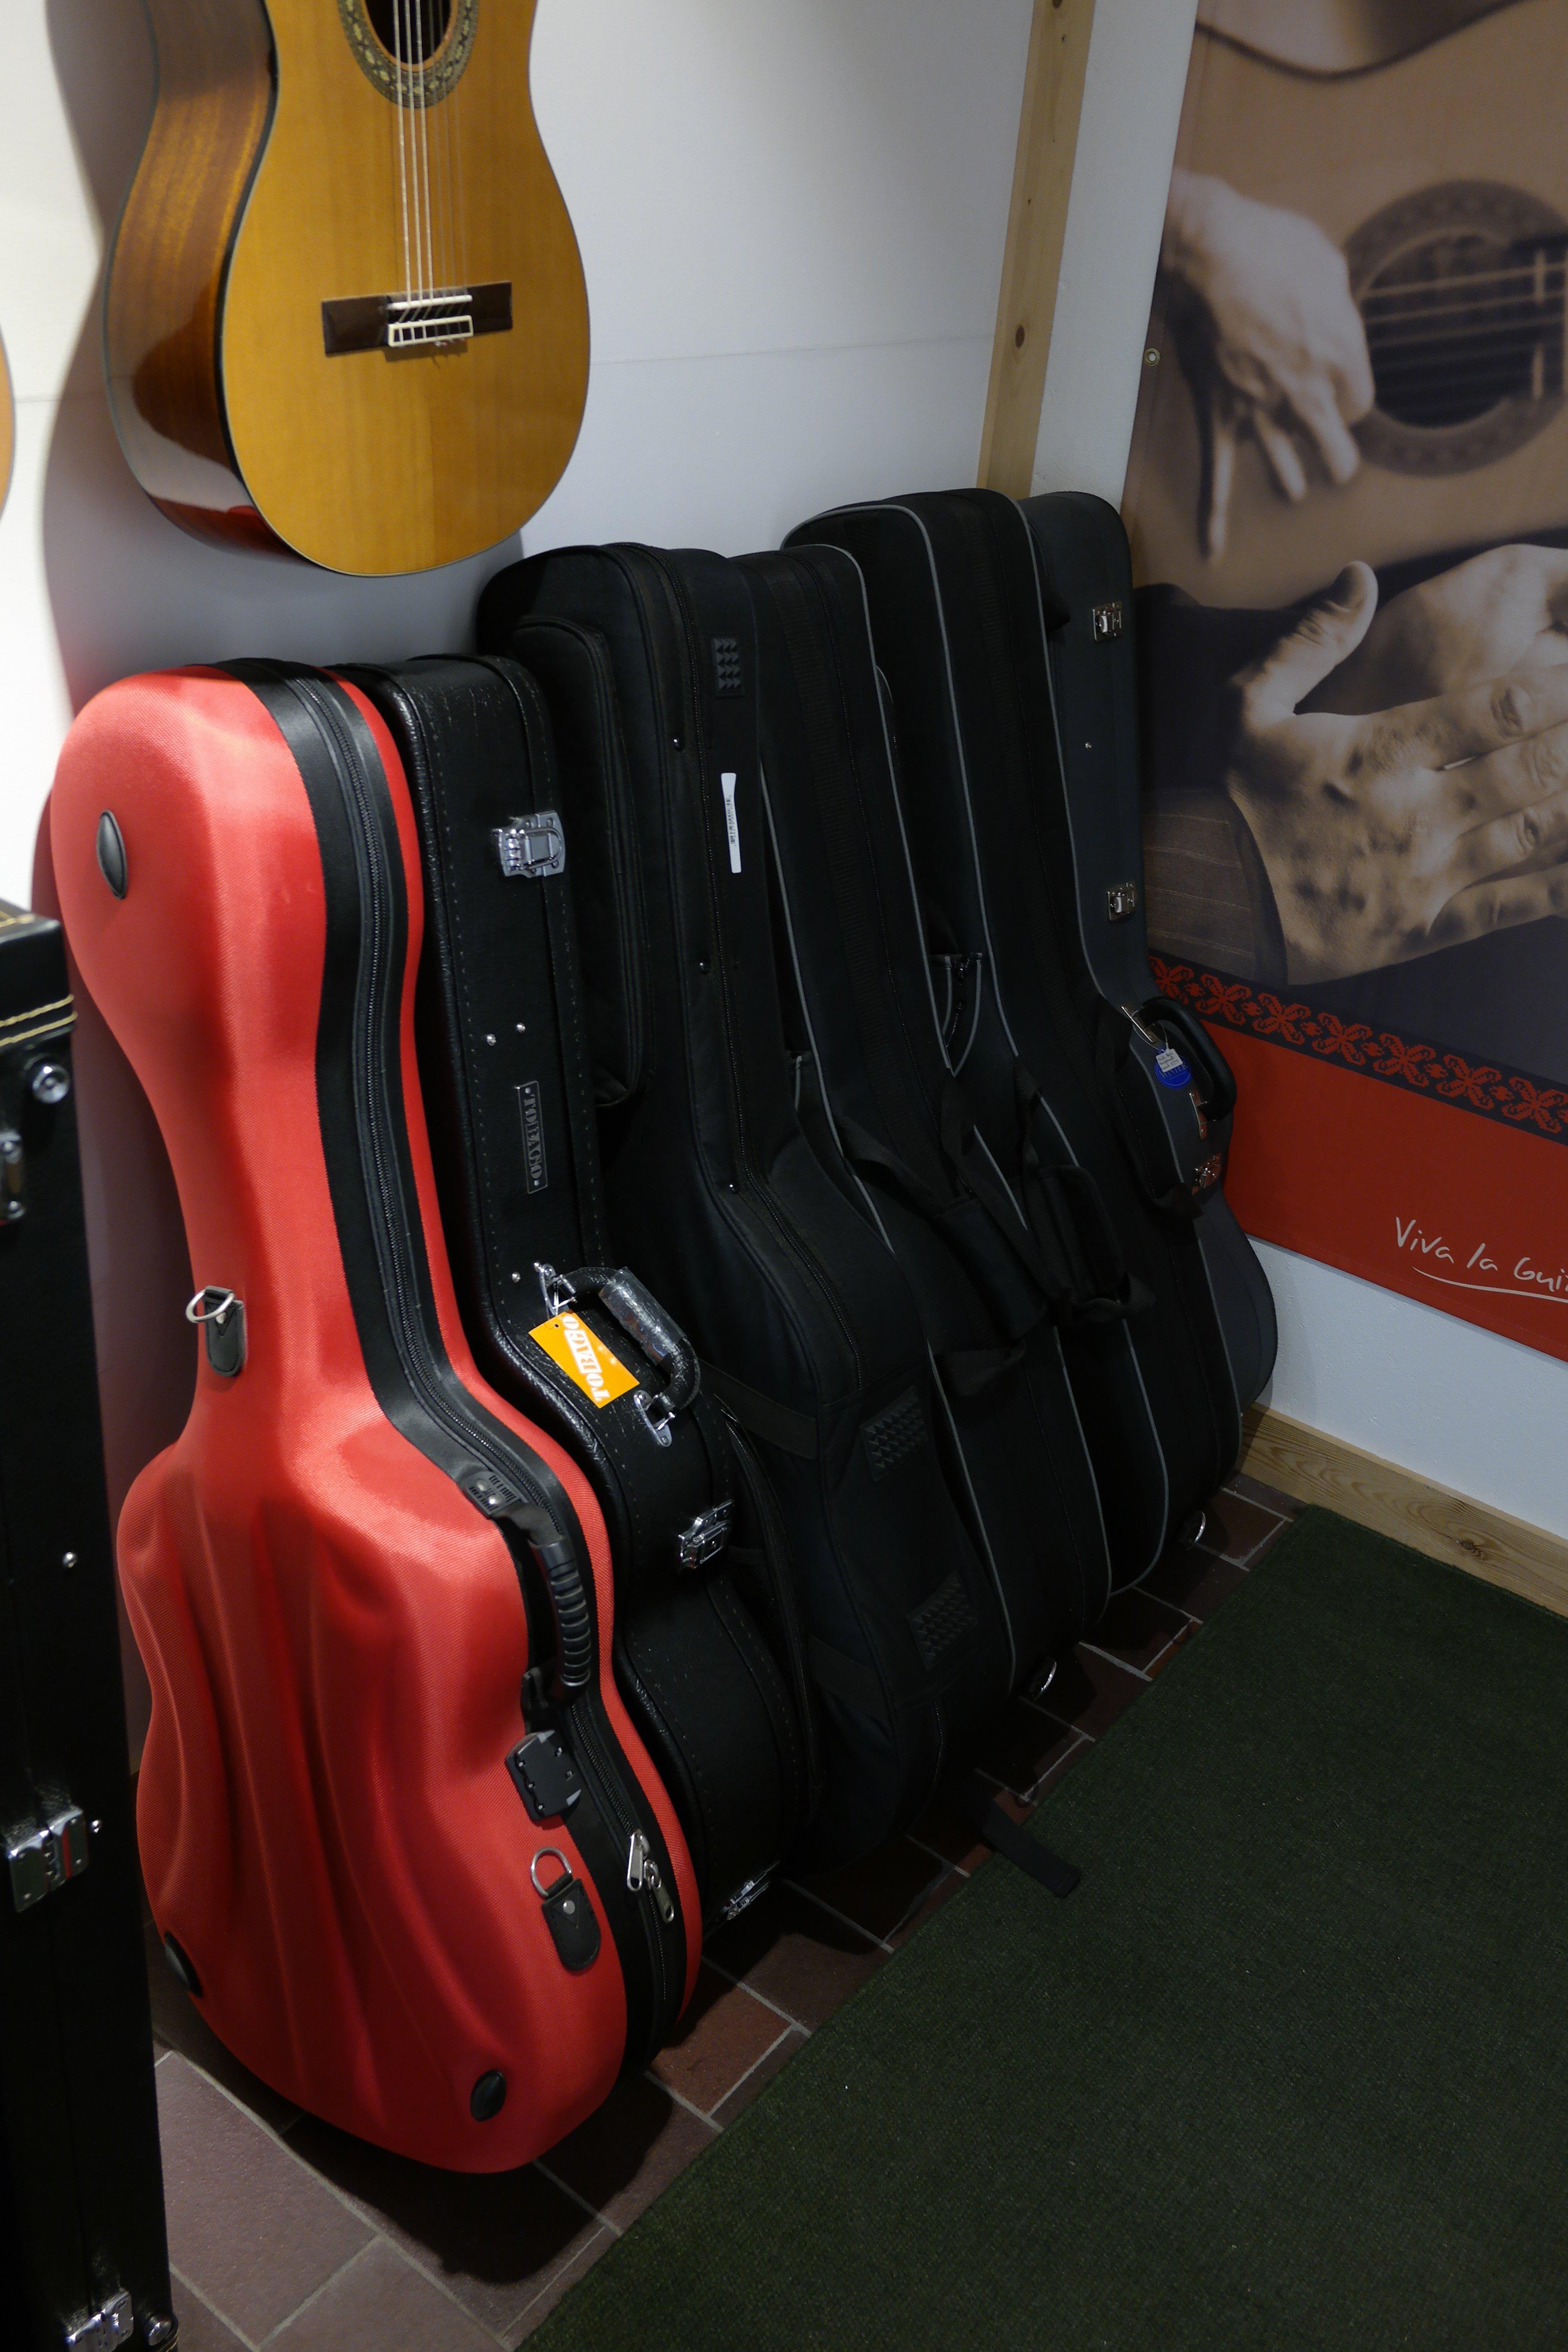 gitaar koffers